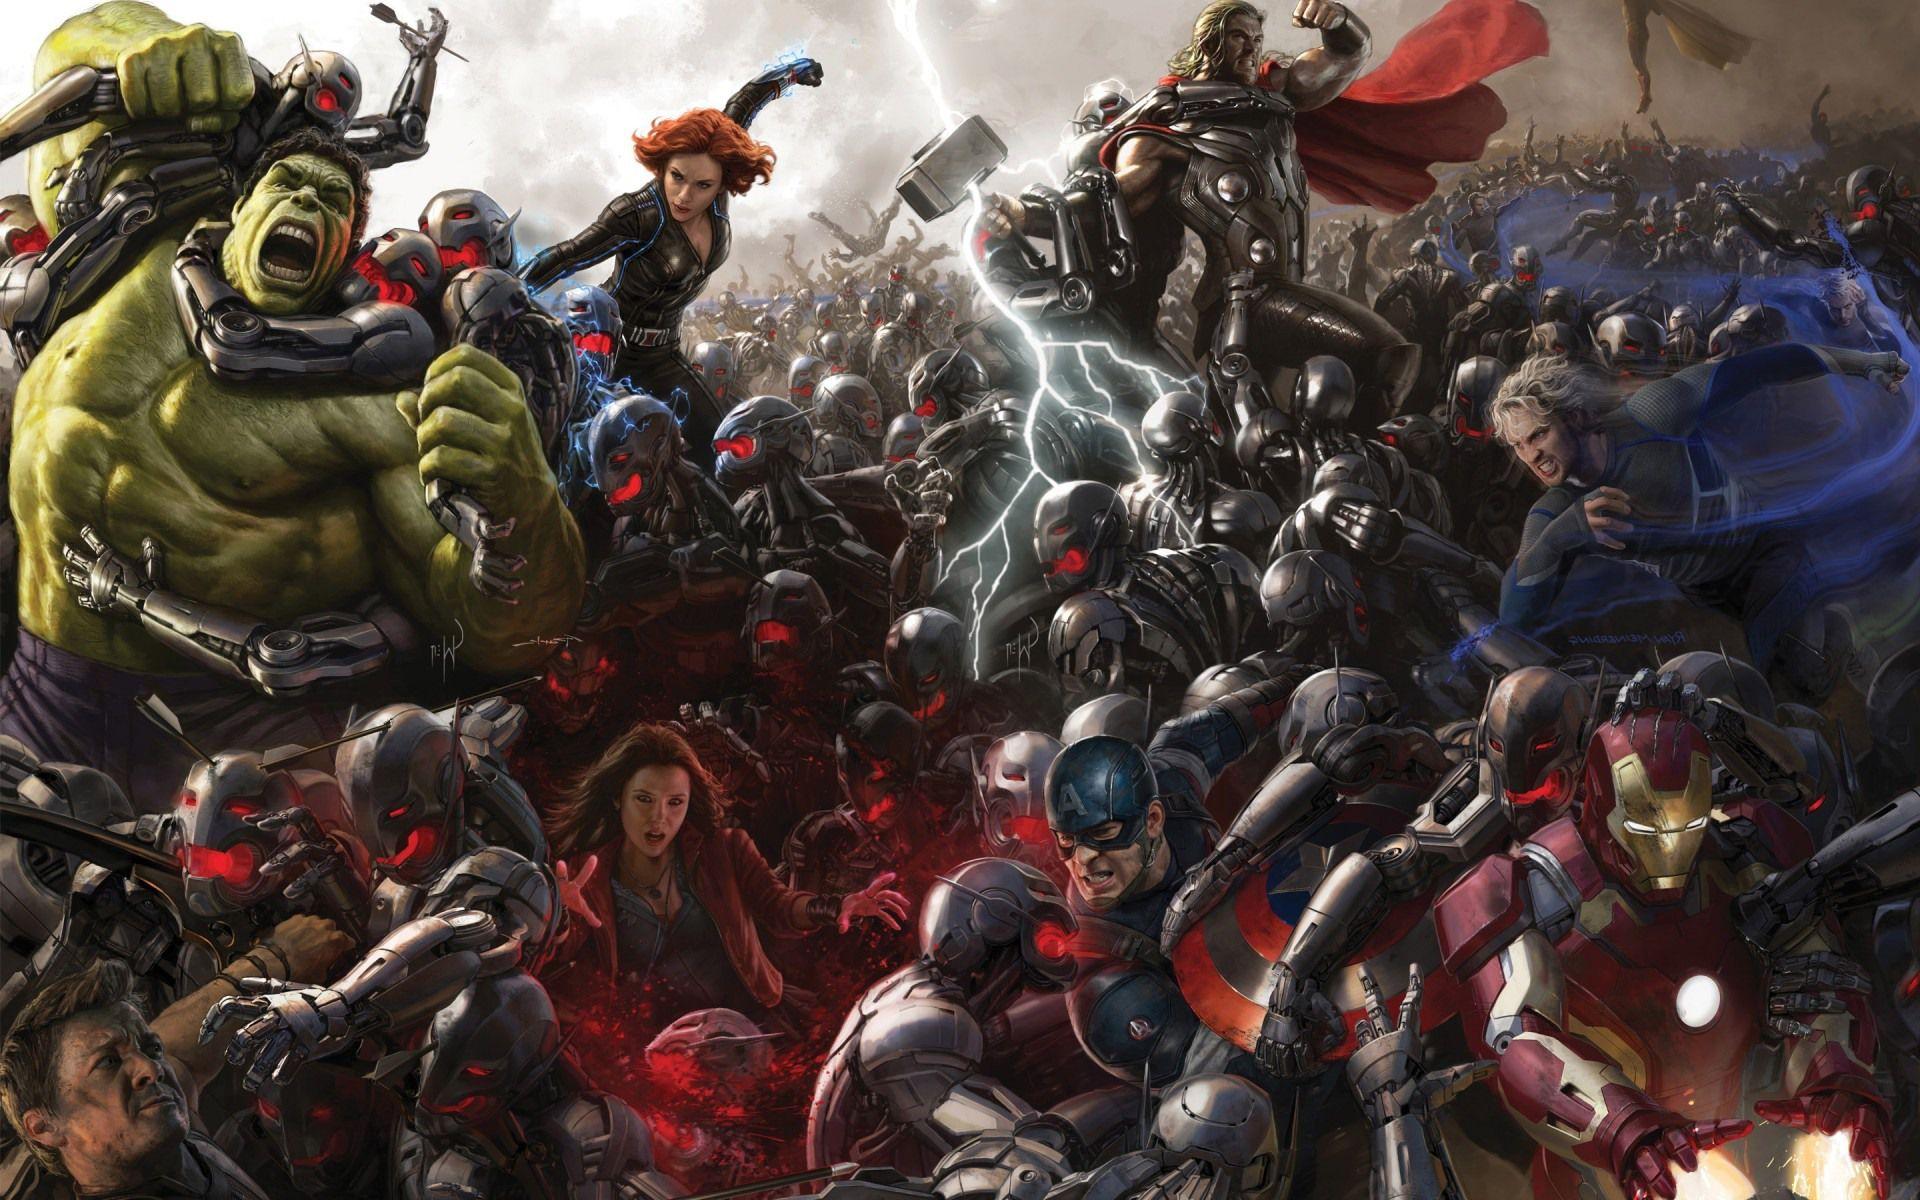 Avengers Age of Ultron 2015 Wallpaper Desktop   HD Wallpapers 1920x1200